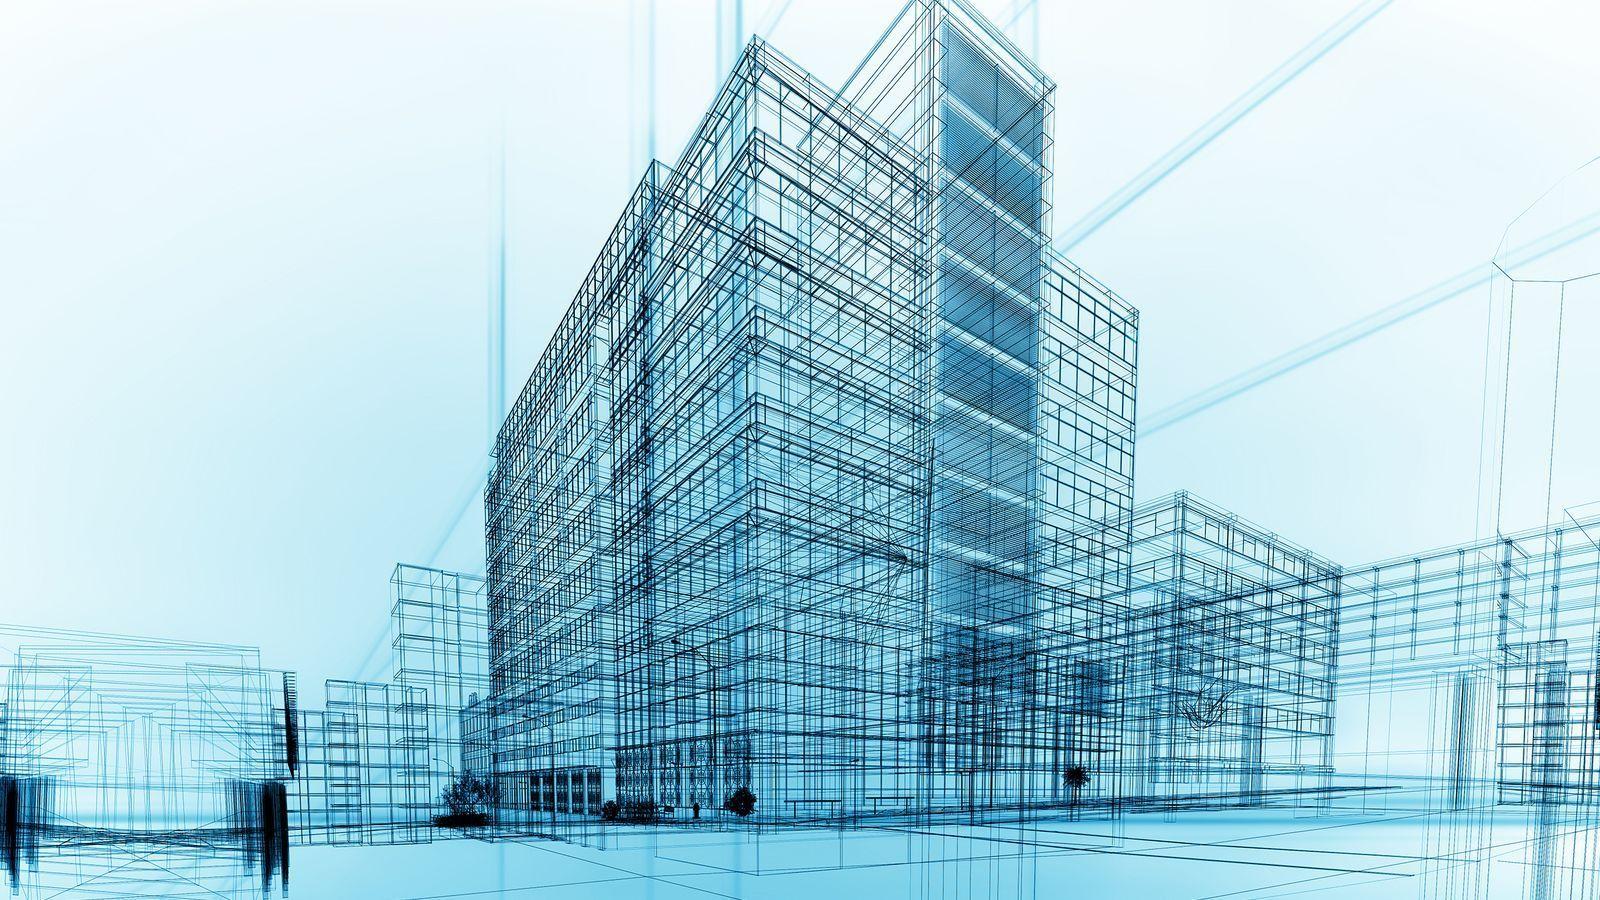 50 Civil Engineering Wallpapers Download At Wallpaperbro 2020